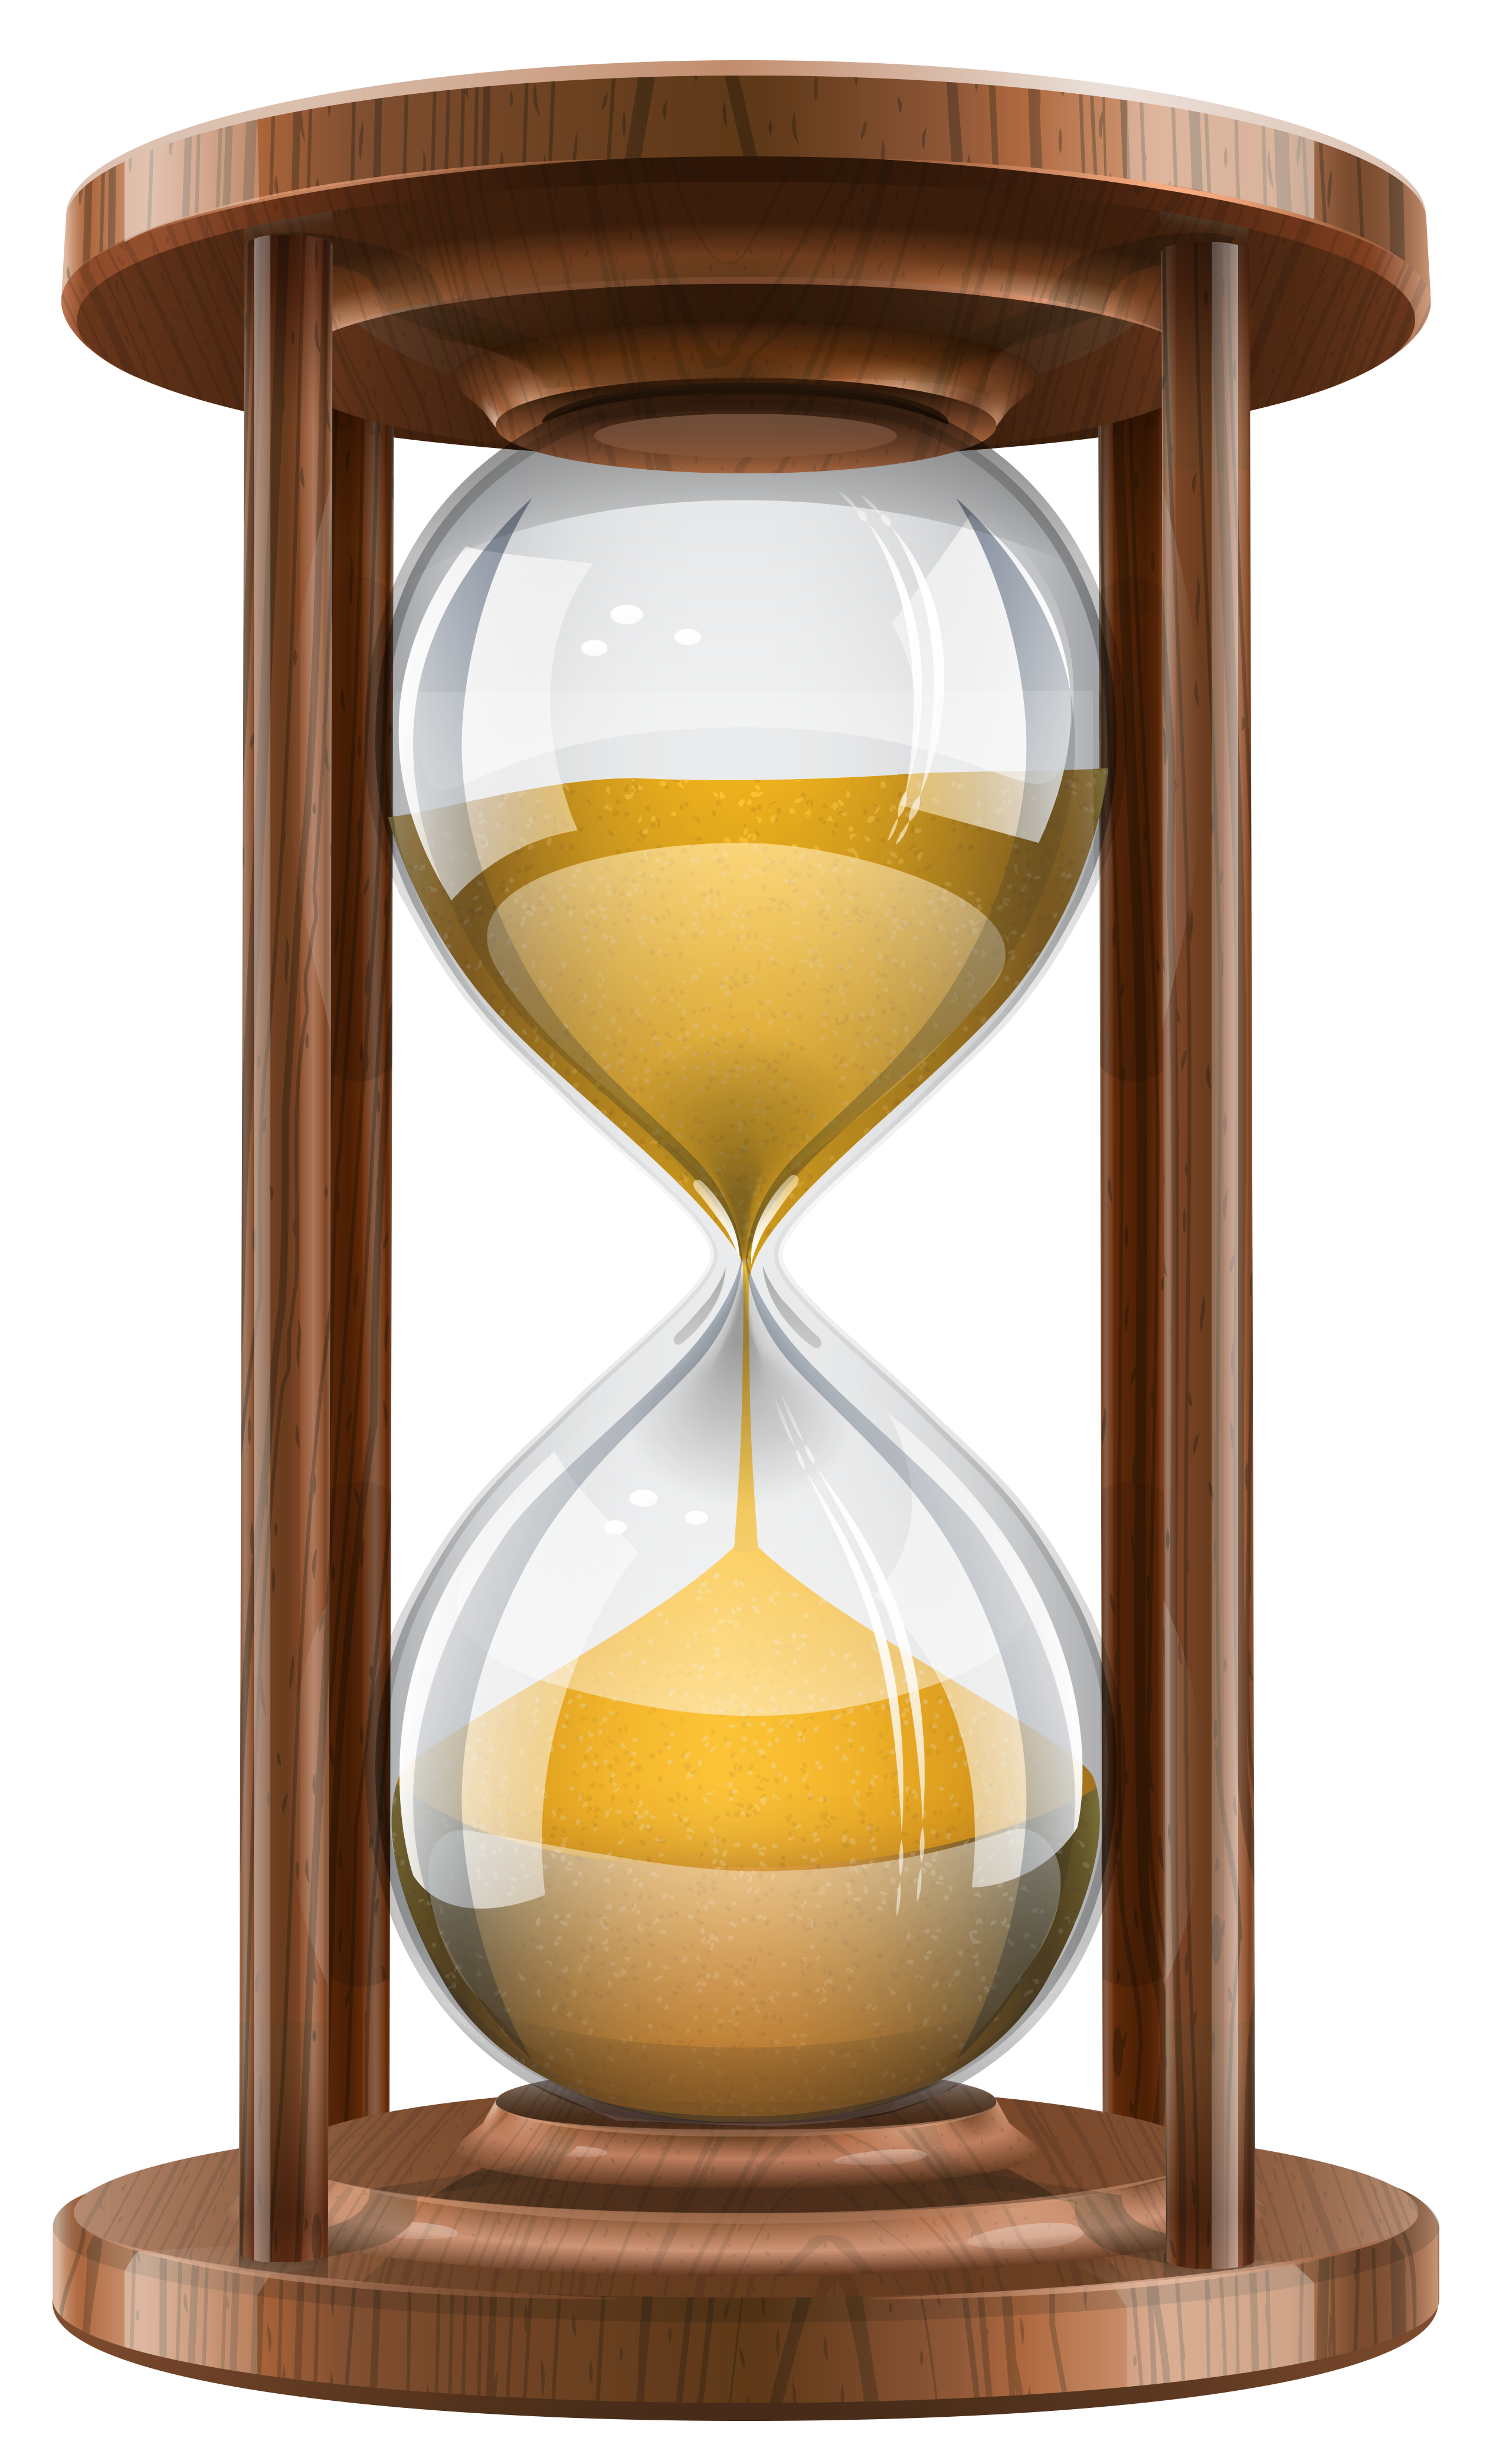 Clock png transparent images. Free sand timer clipart